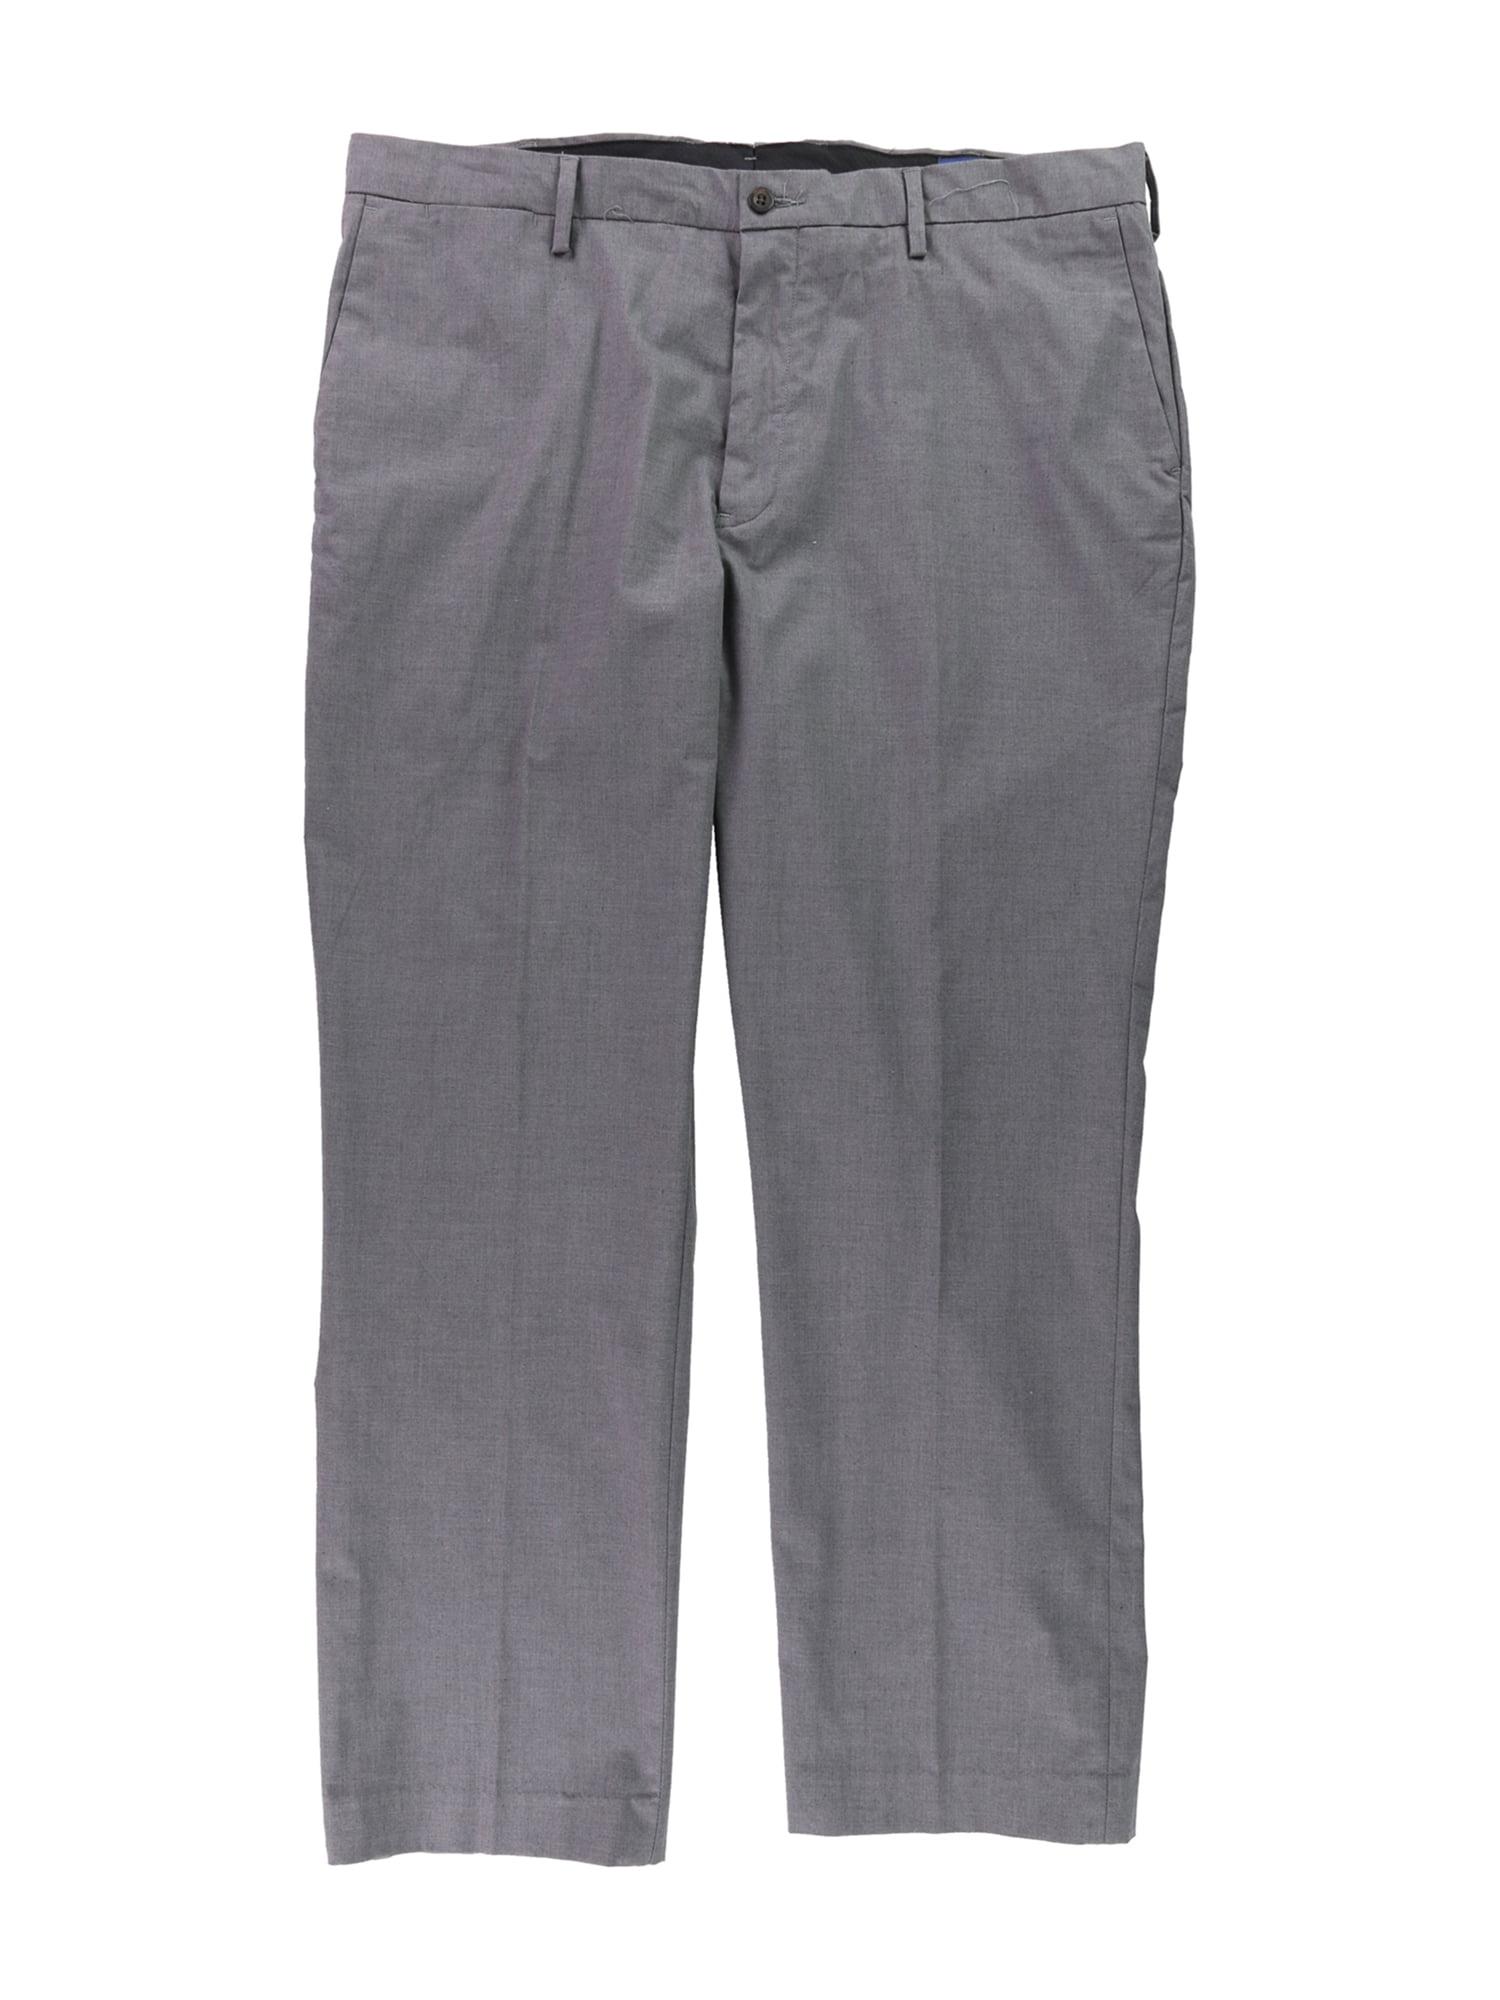 Ralph Lauren Mens Stretch Dress Slacks